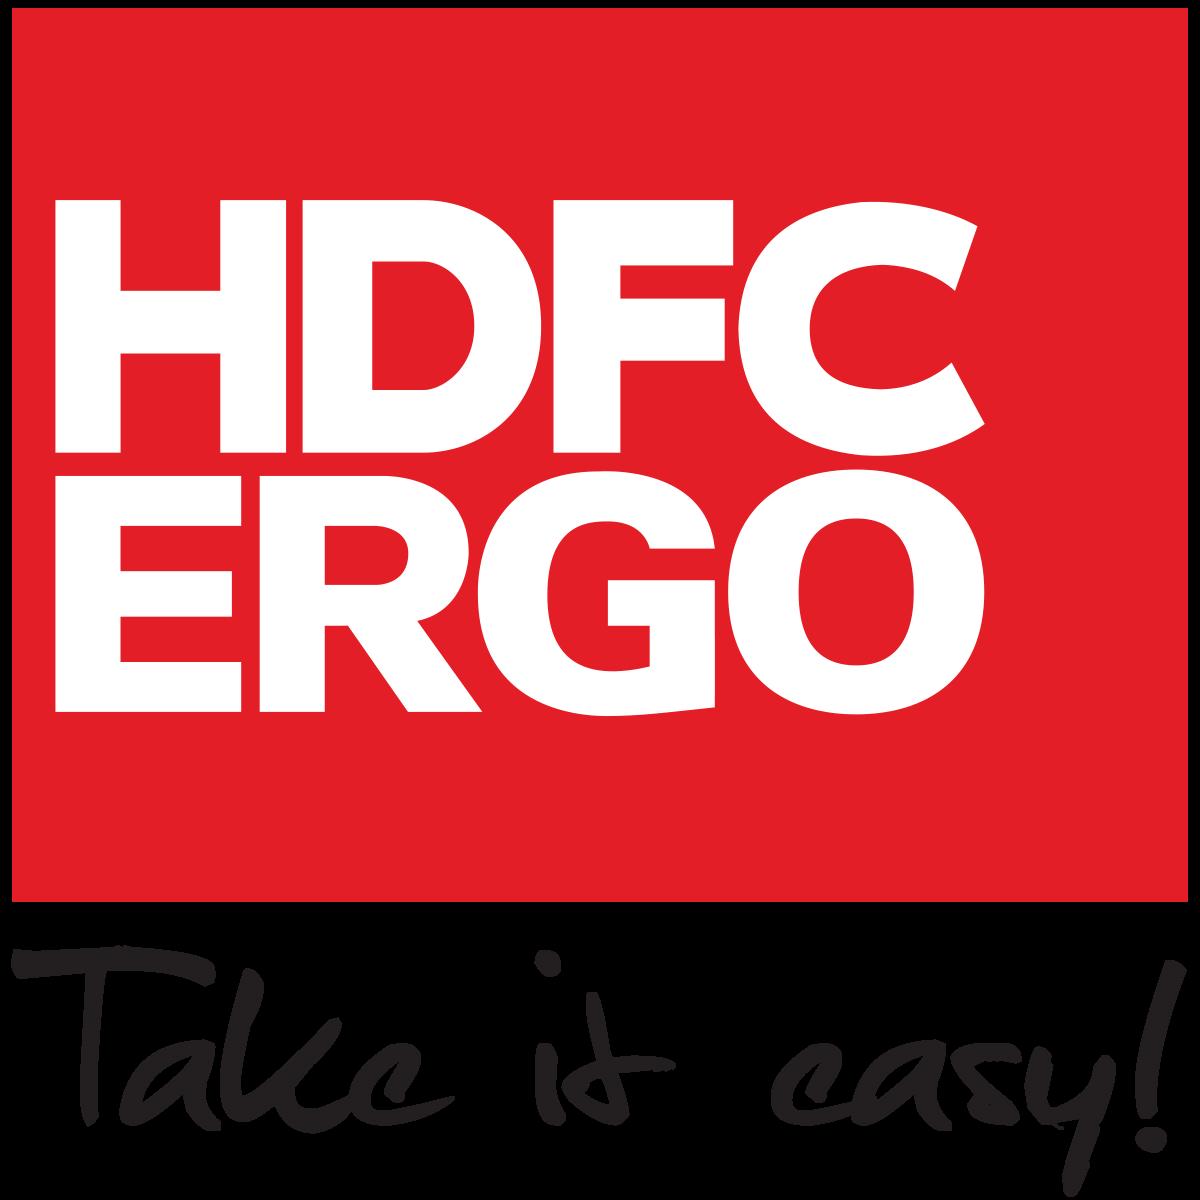 hdfc_ergo